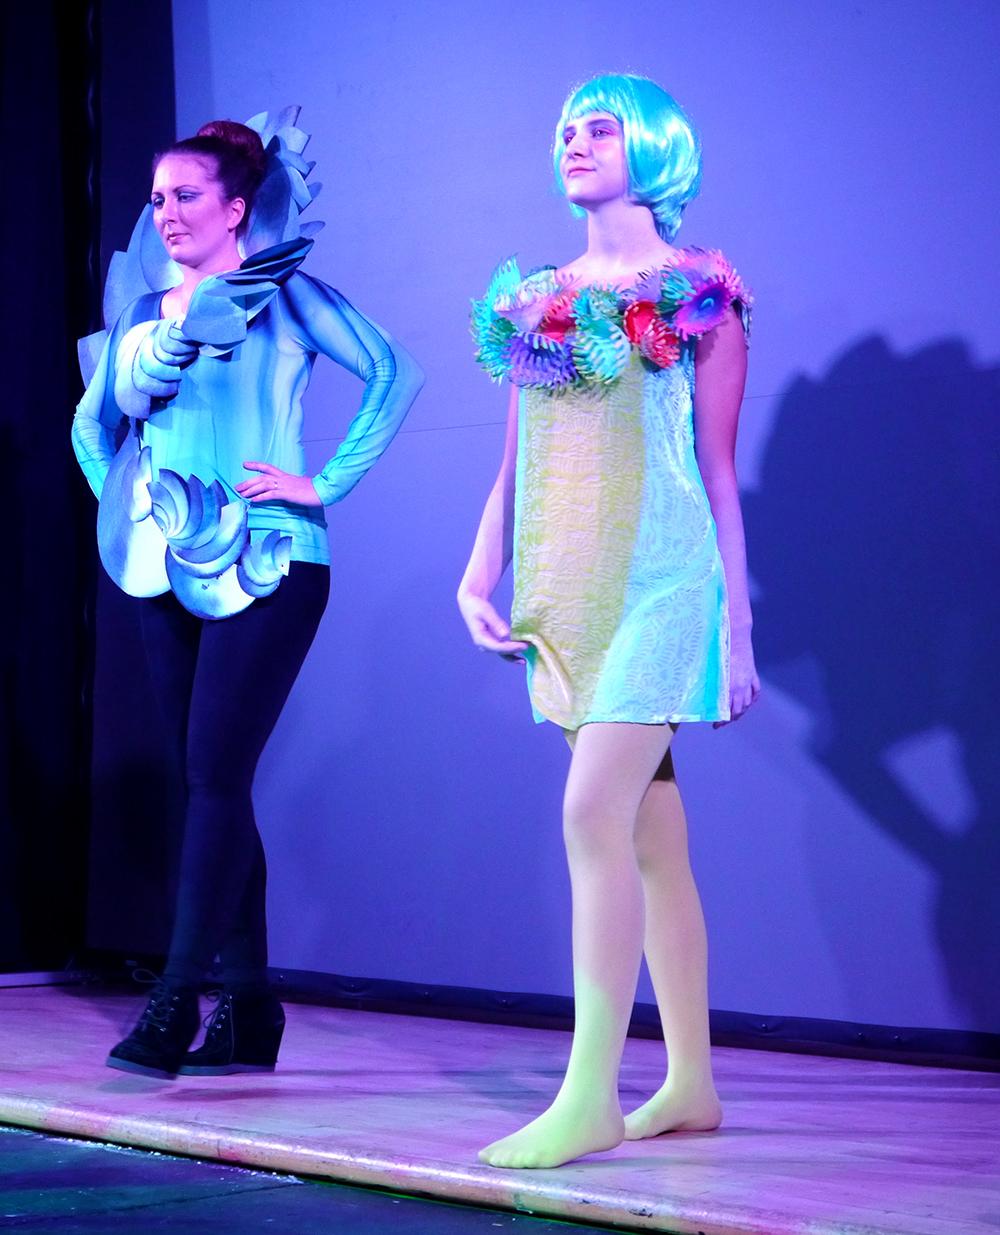 Dundee Wearable Art, Dundee Wearable Art Show, Wearable art, performance, fashion and art, Scottish Bloggers, Iona Godfrey-Faussett - Spiral of the Shell, Gabrielle von Waldburg - Deep Sea Diva, shell costume, shell outfit, coral costume, coral outfit